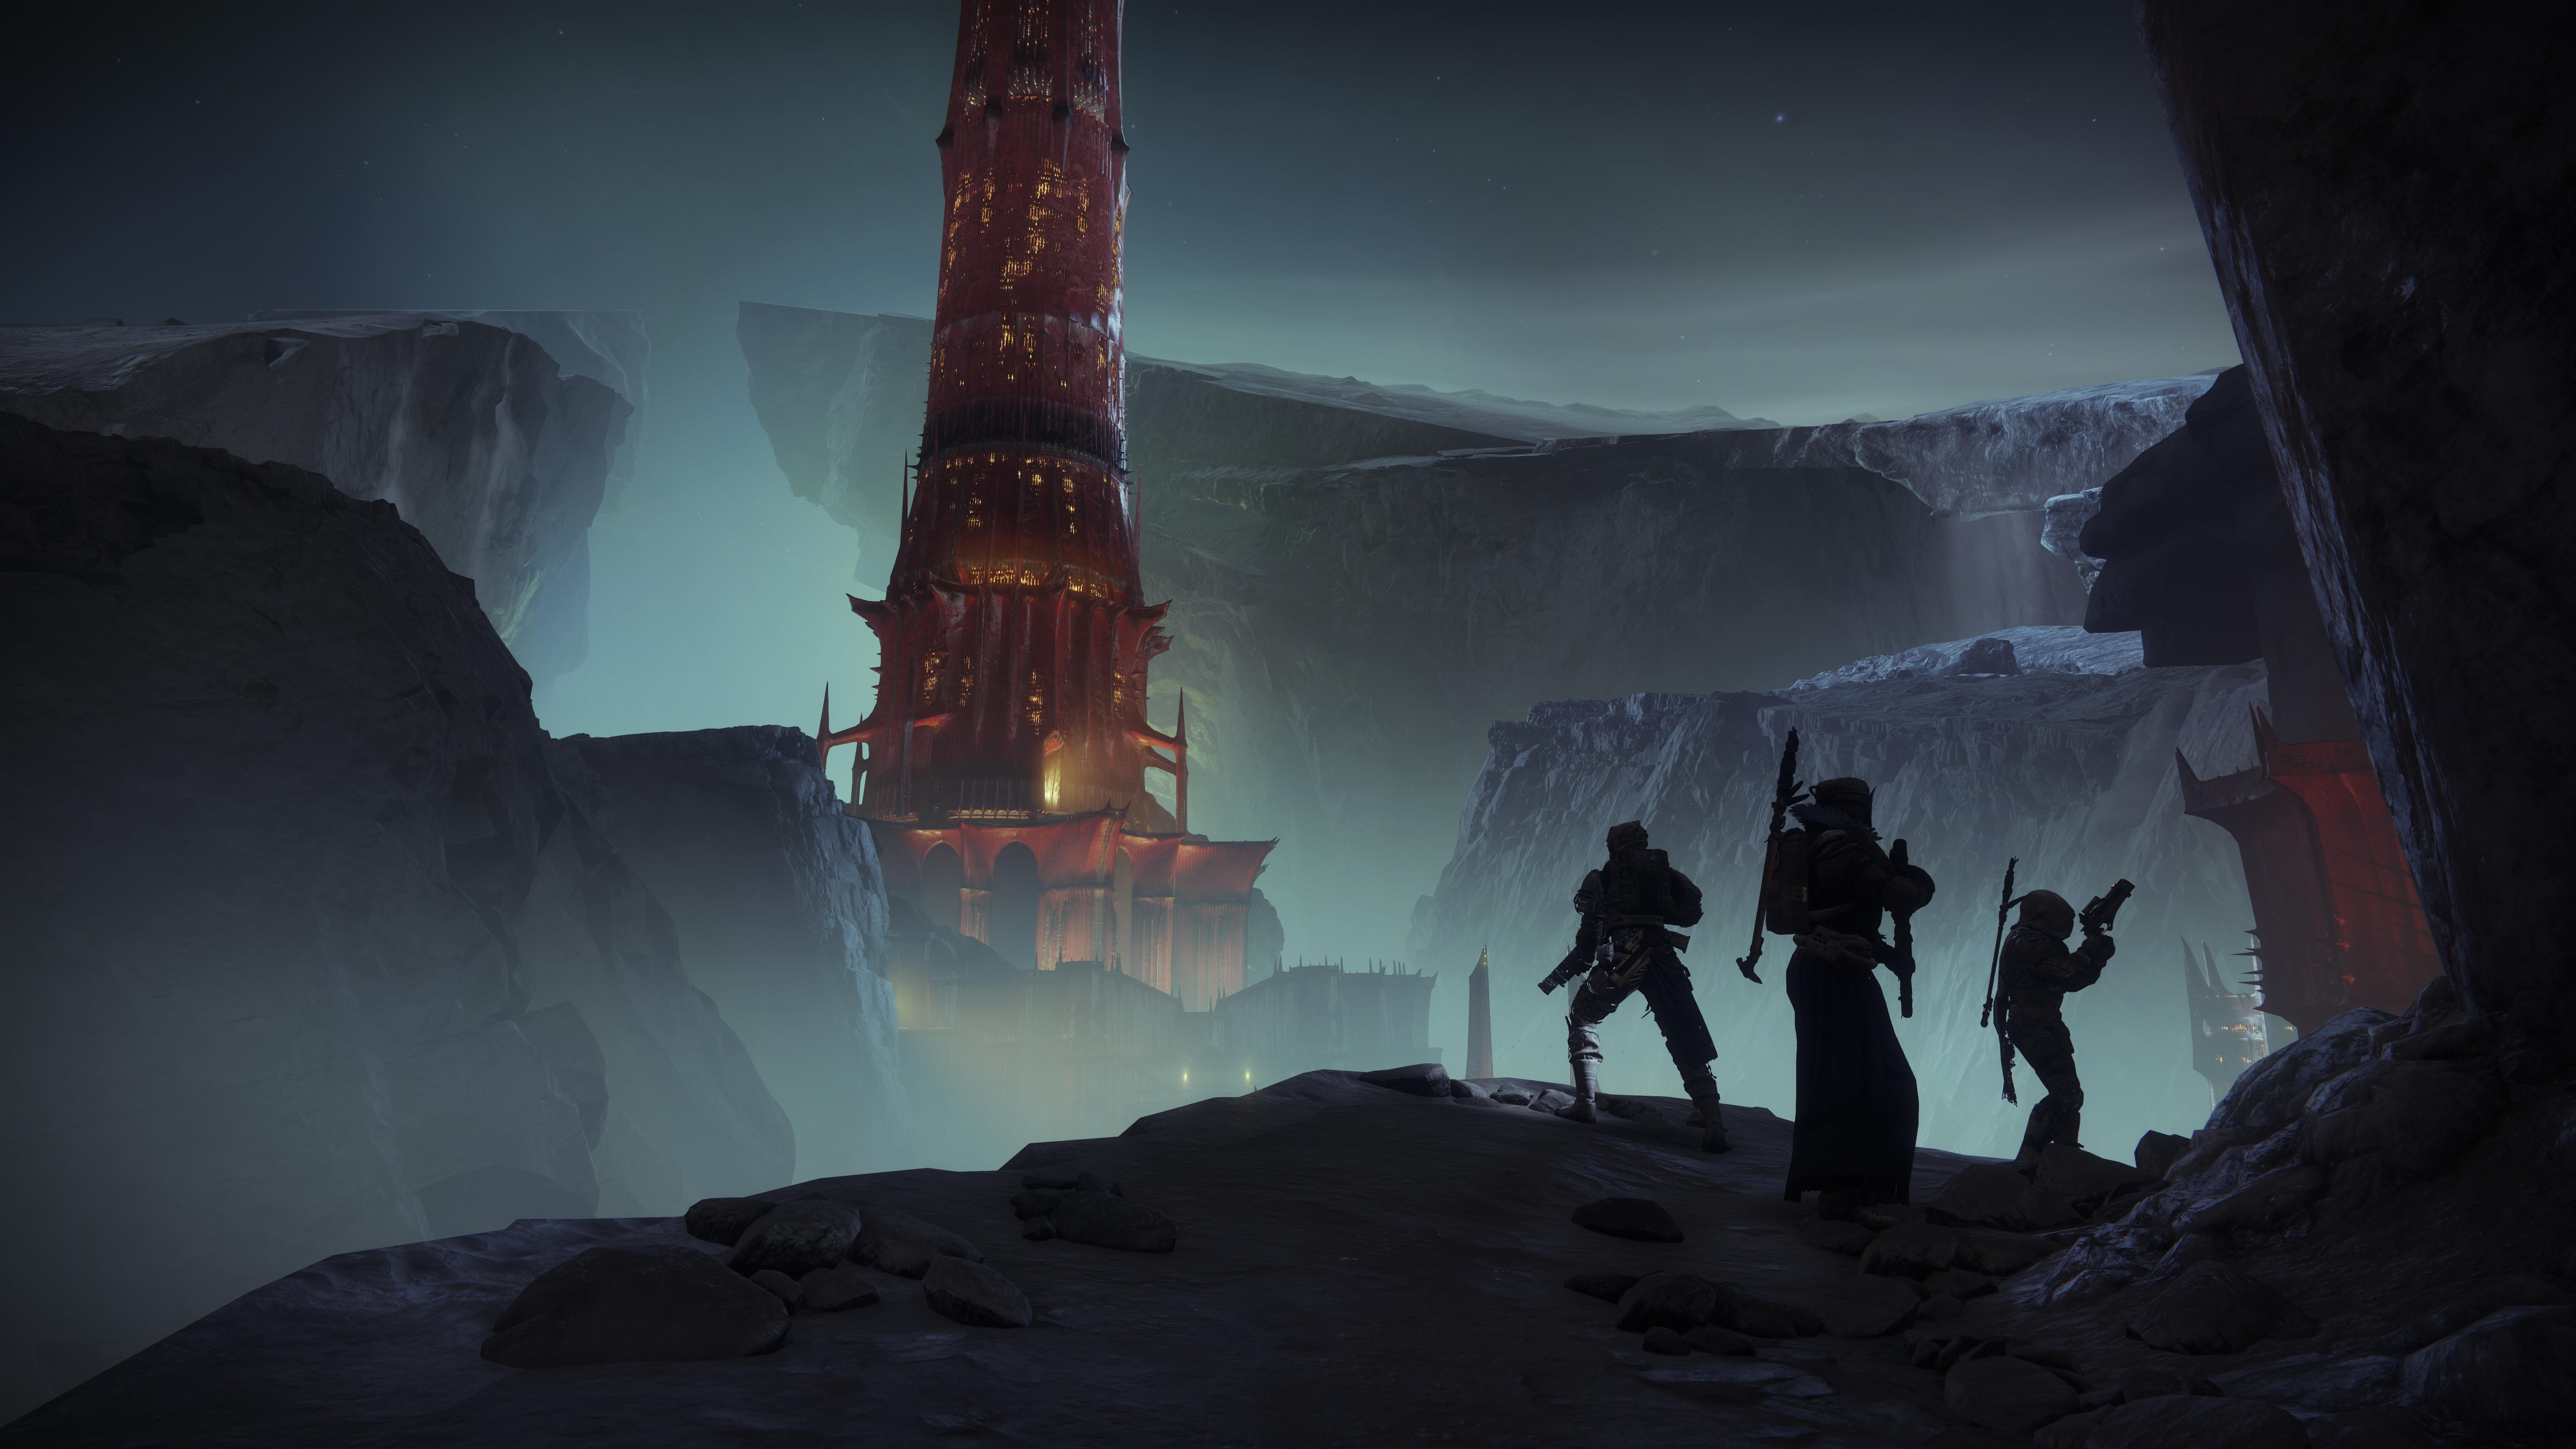 Guardians look at the spooky, scarlet keep in Destiny 2: Shadowkeep